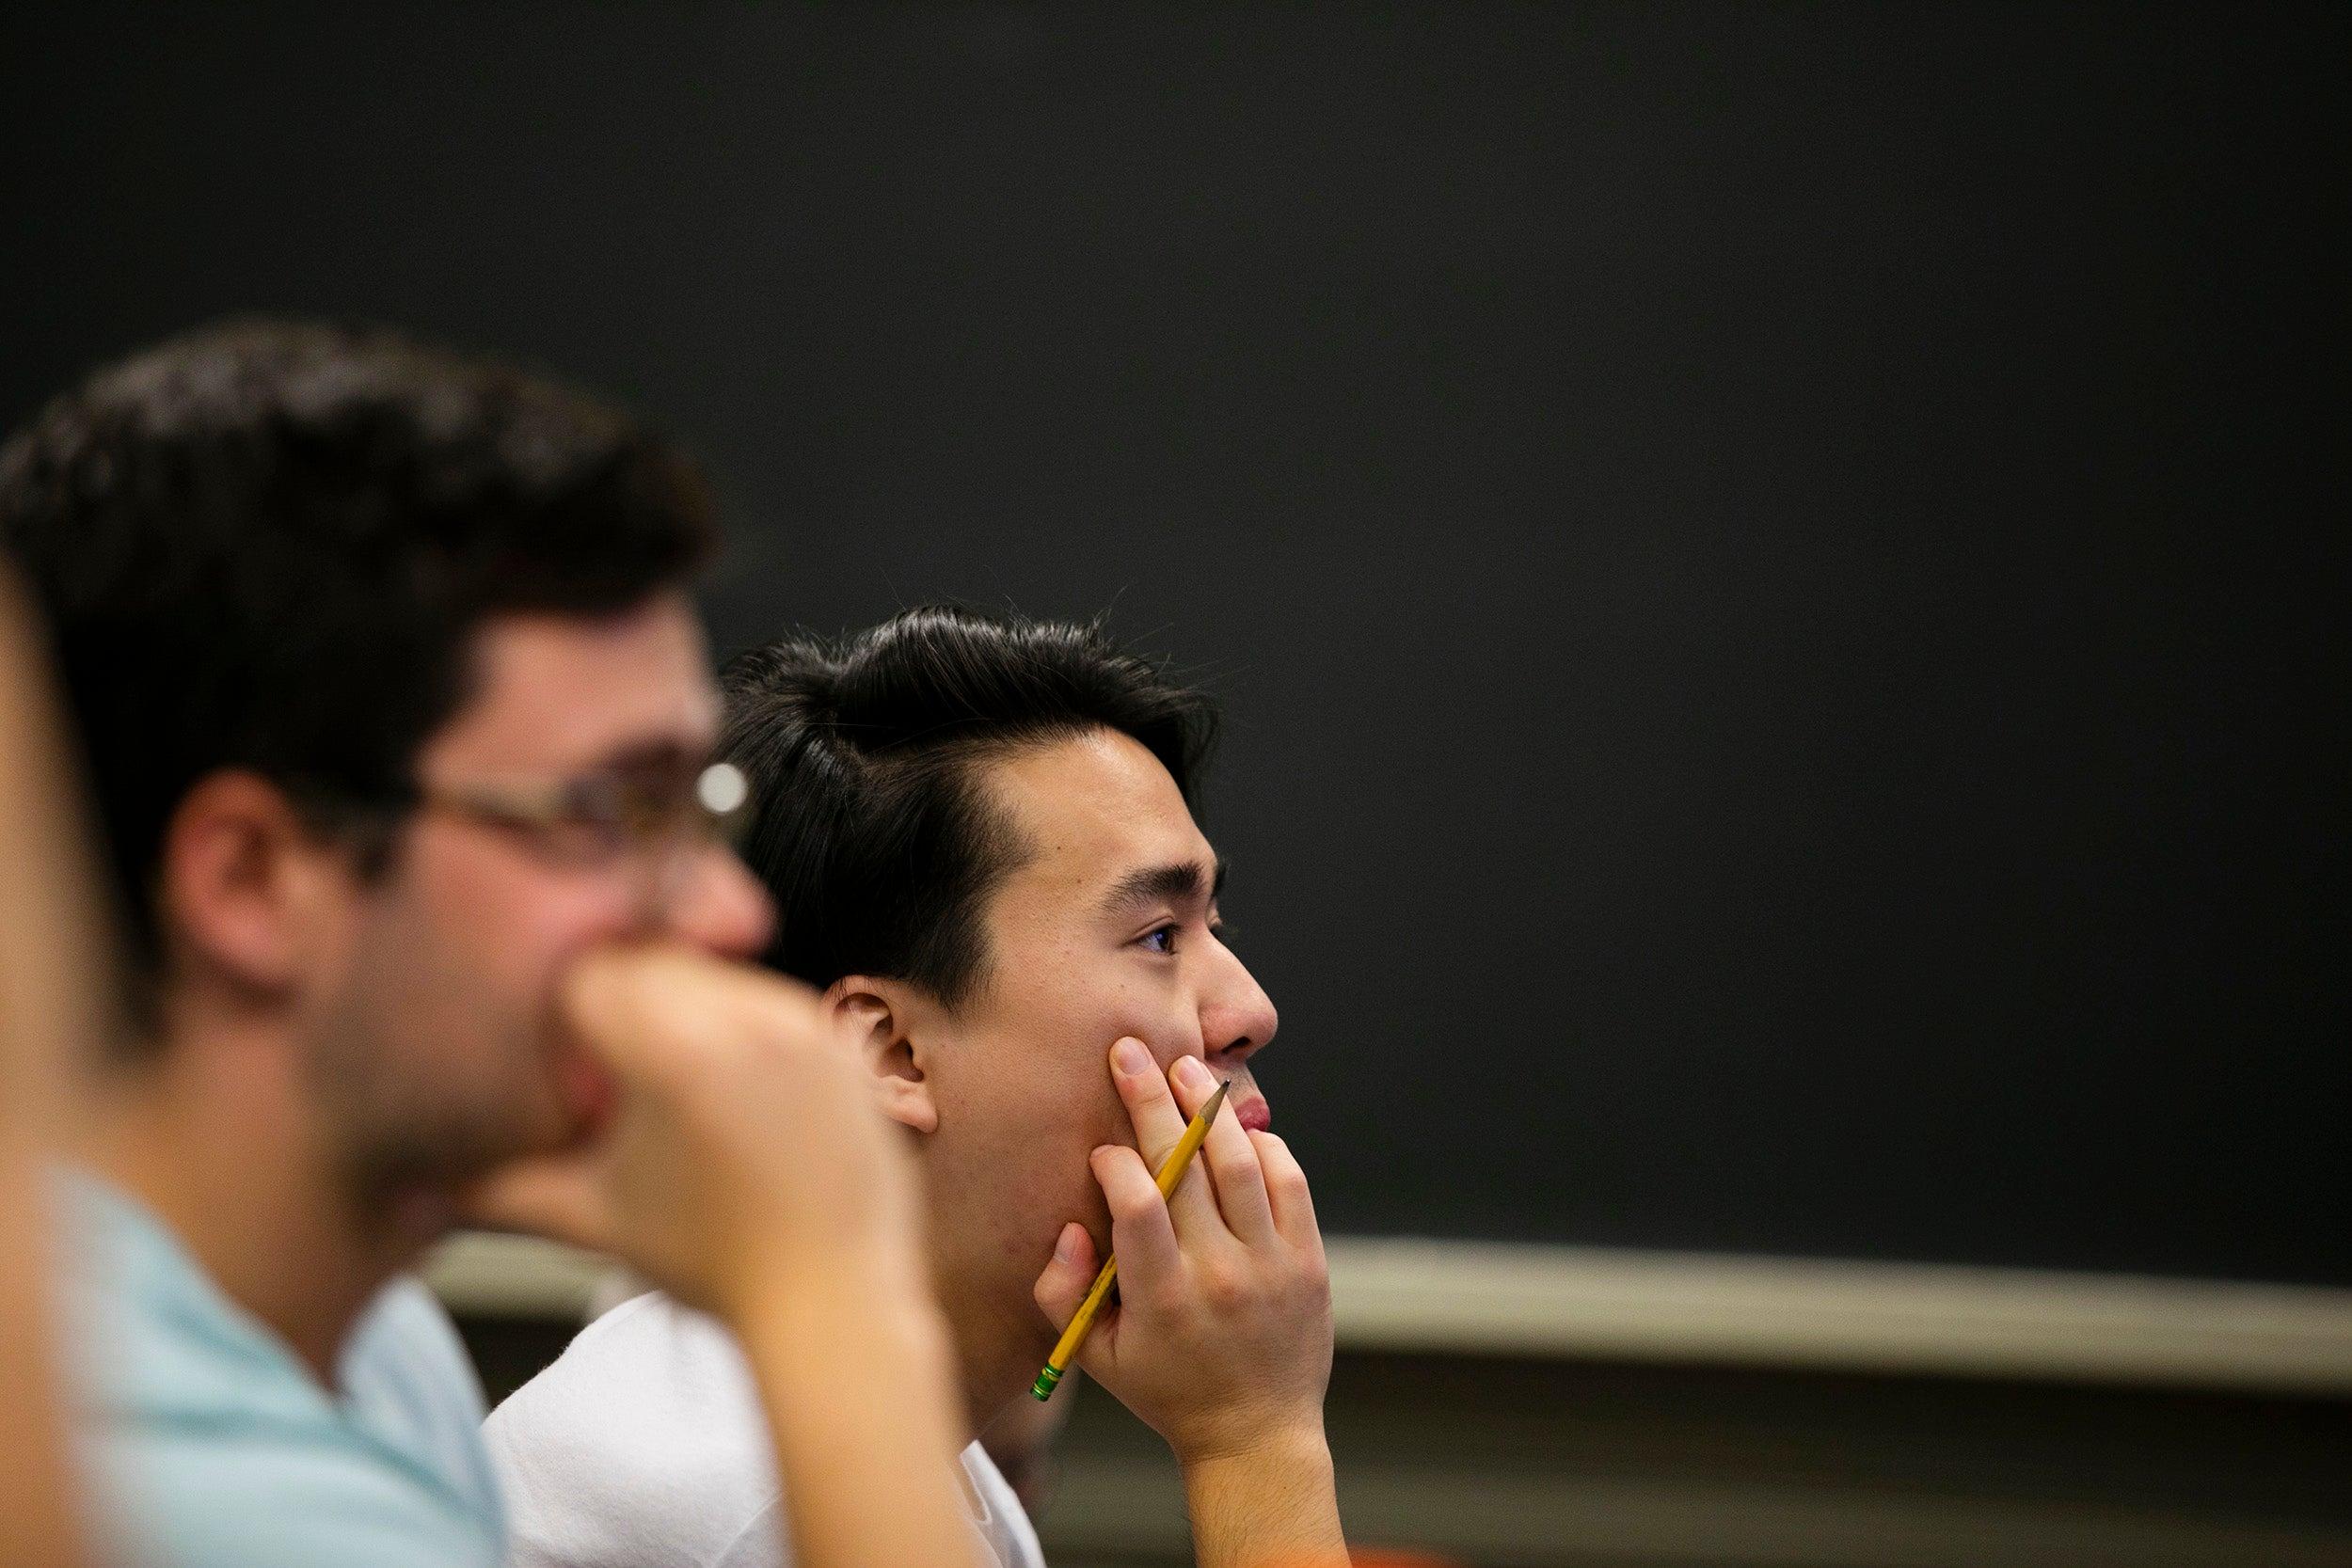 Students listen during class.